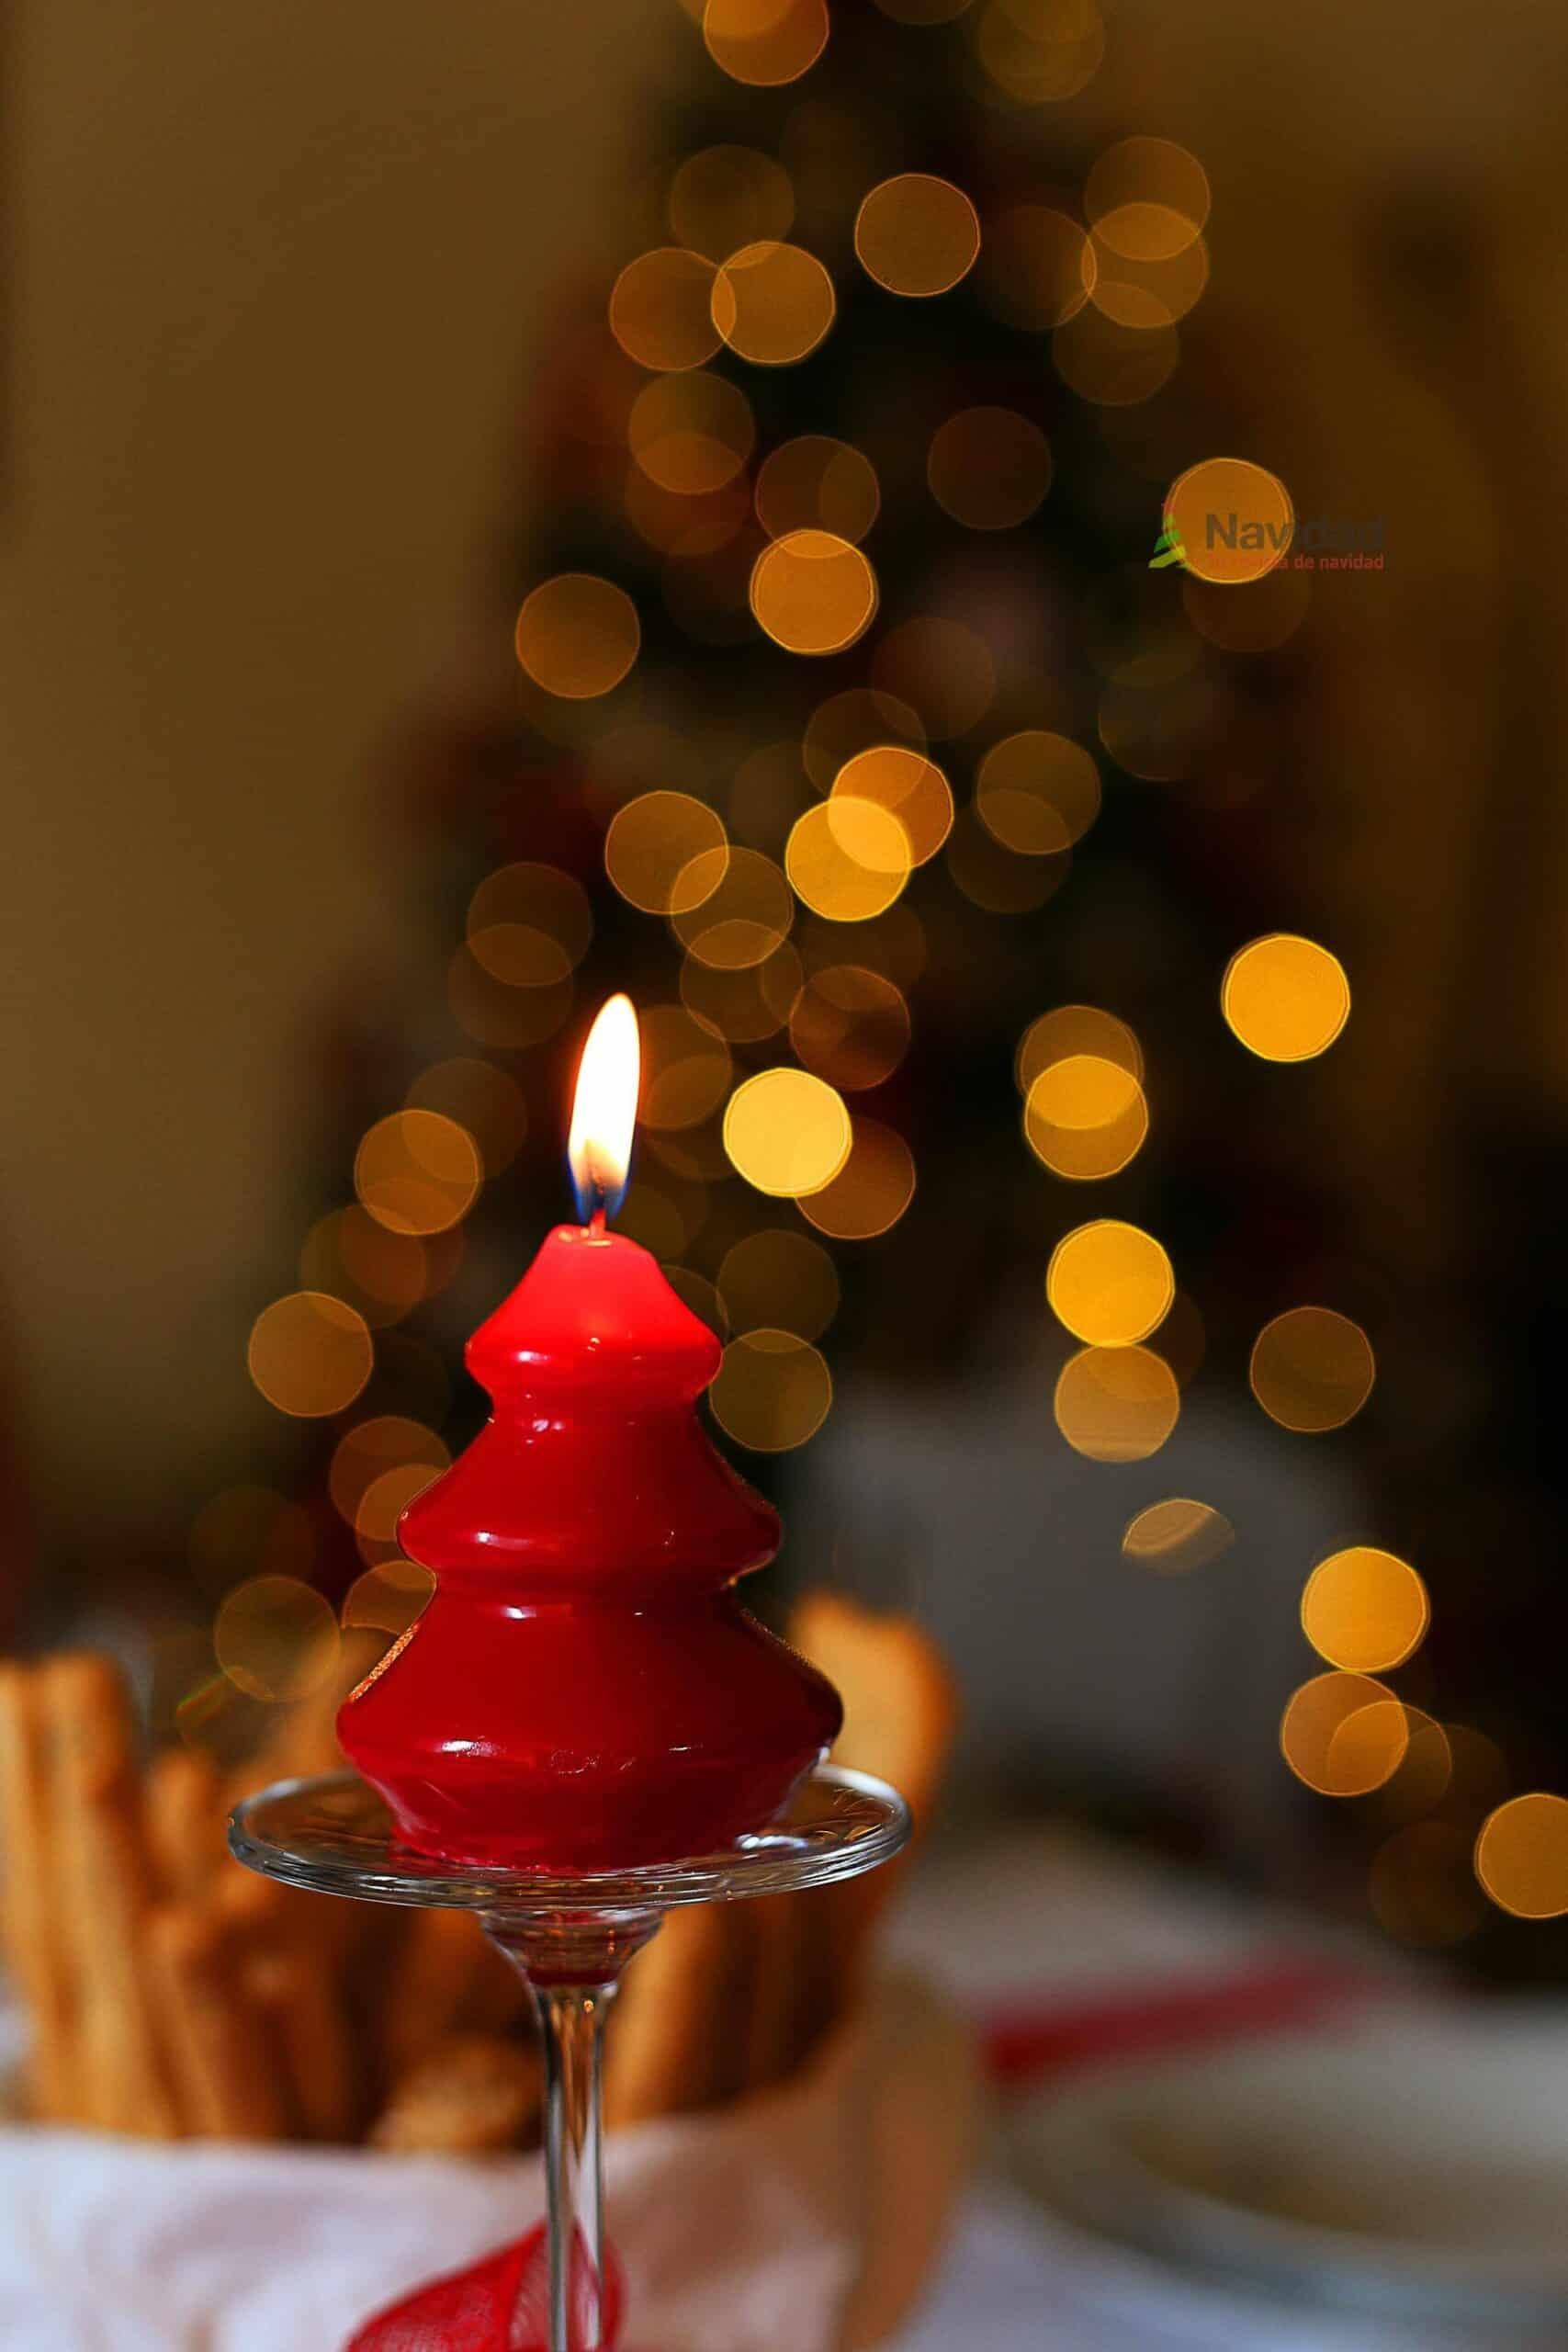 Centros de mesa navideños en rojo 13